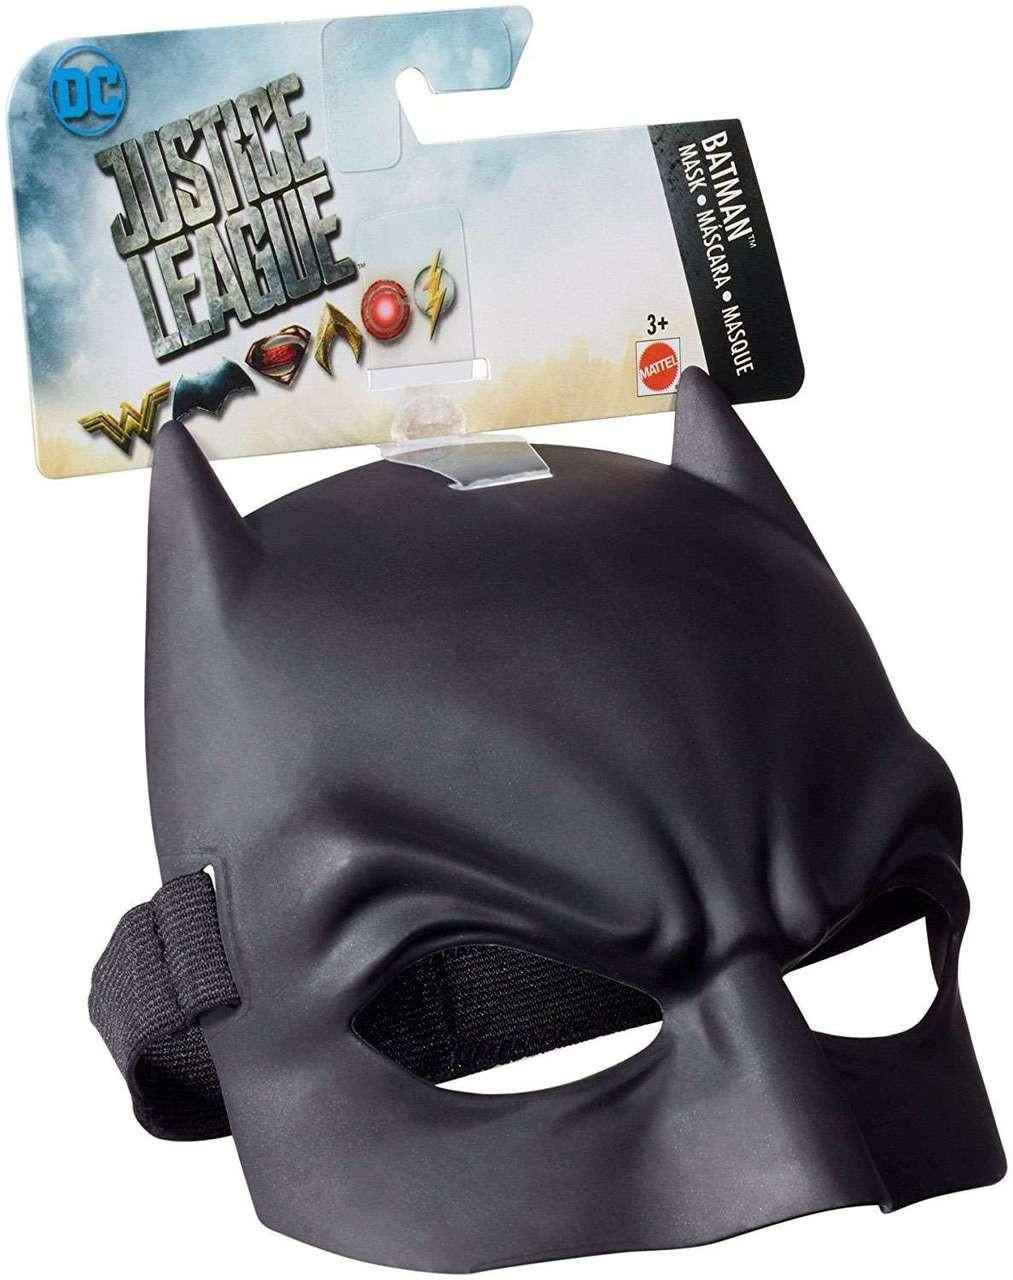 DC JUSTICE LEAGUE BATMAN SNAP /& WEAR MINI HERO ROLE PLAY SET